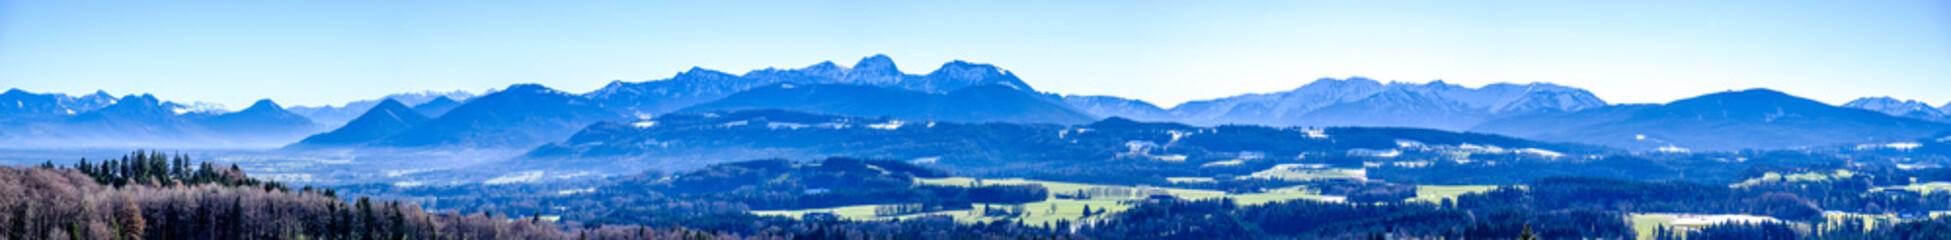 wilparting - bavaria